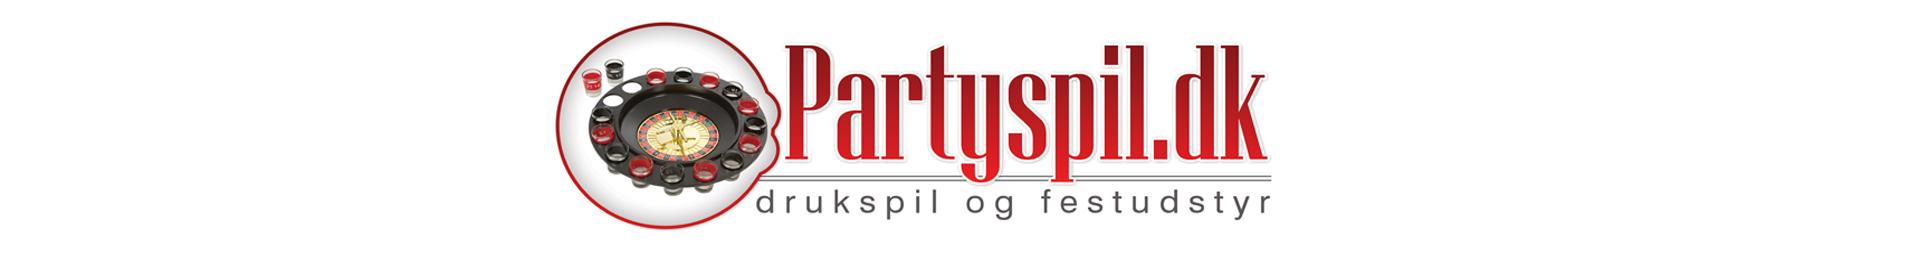 Partyspil.dk